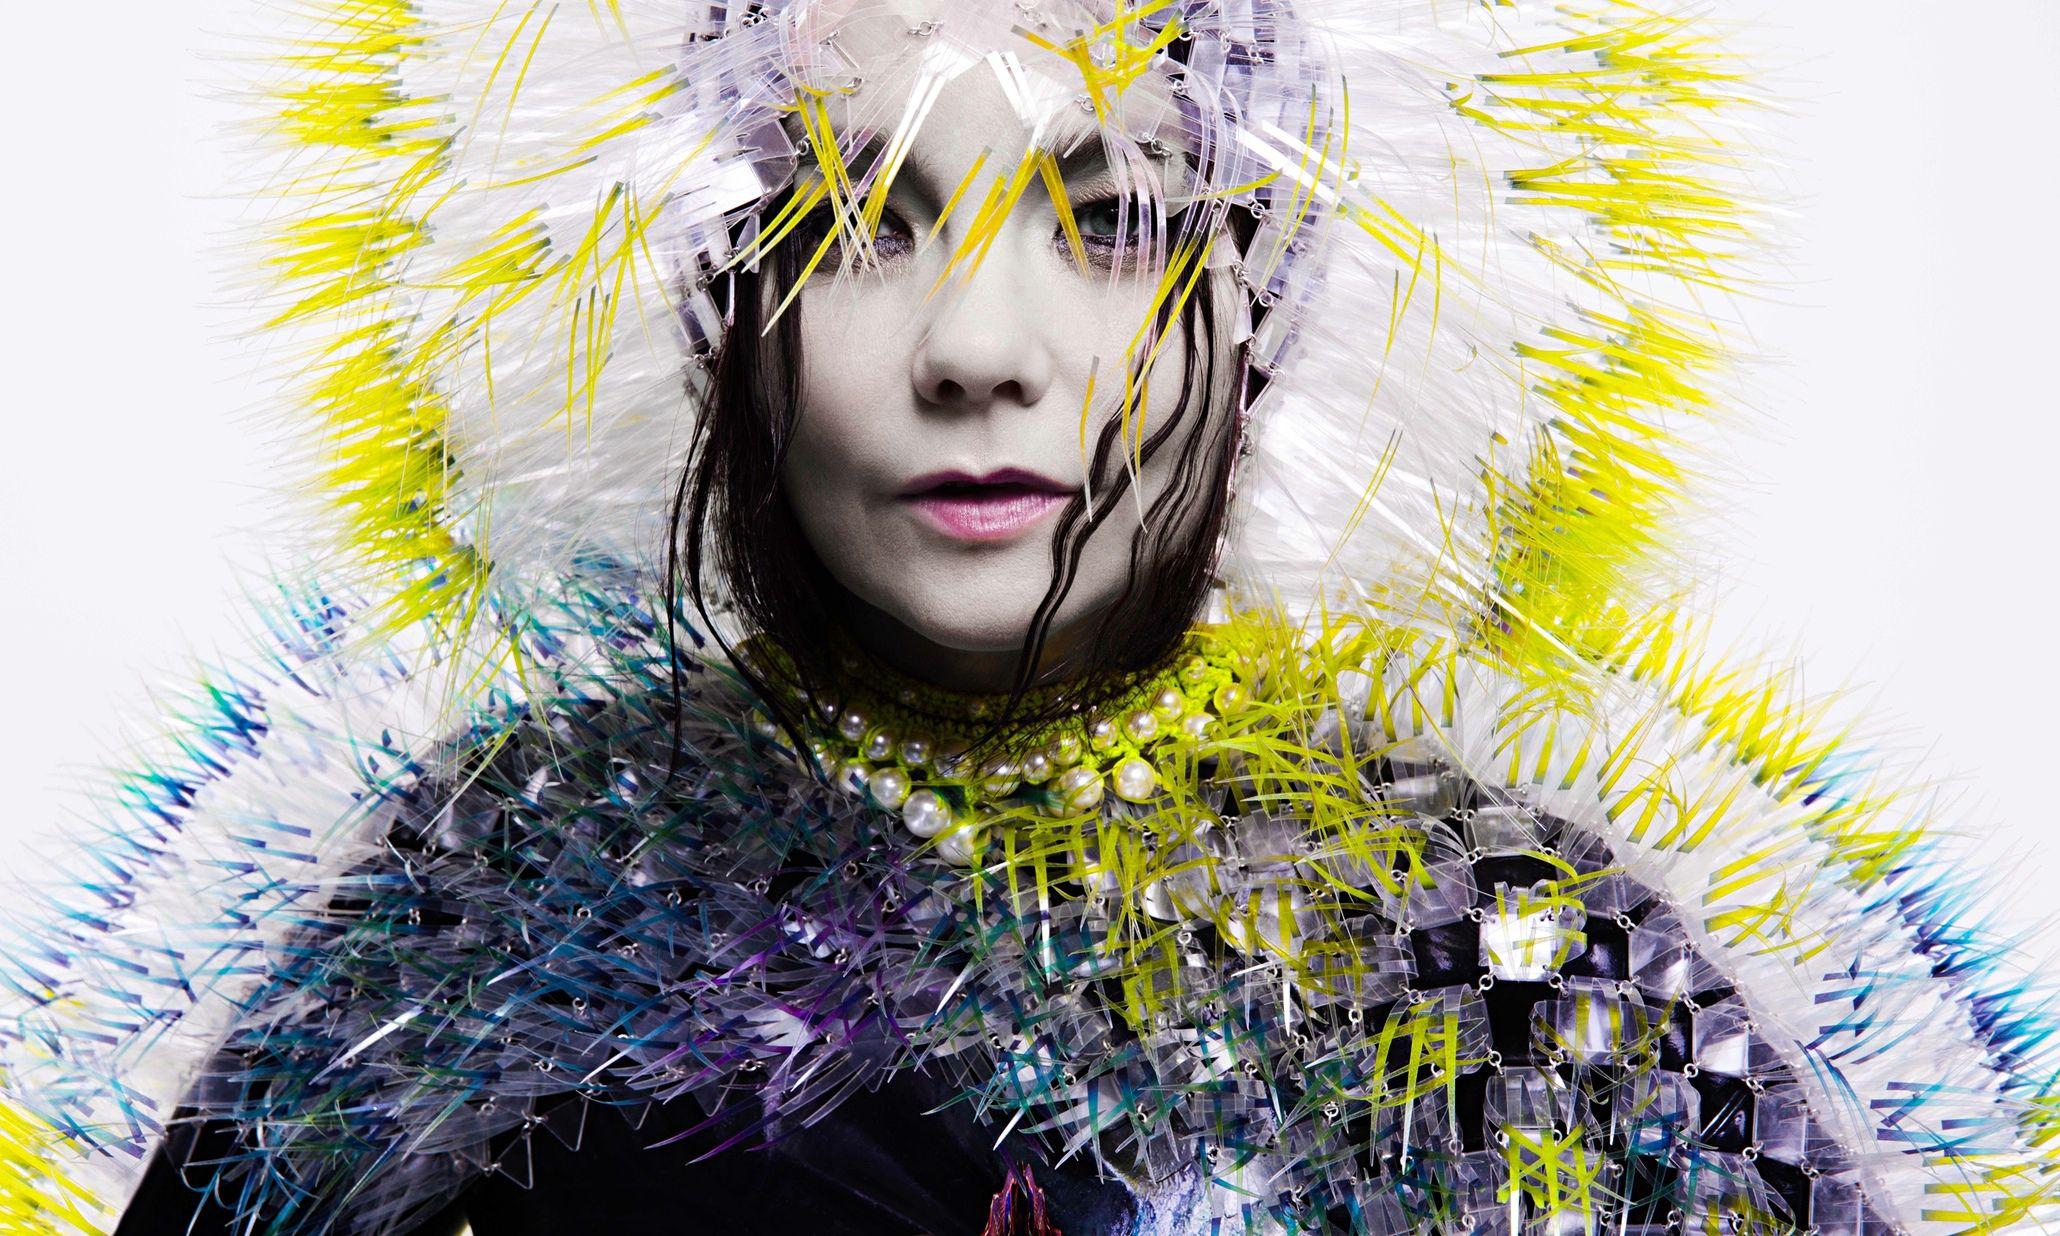 Creative extraordinaire Björk's latest revival